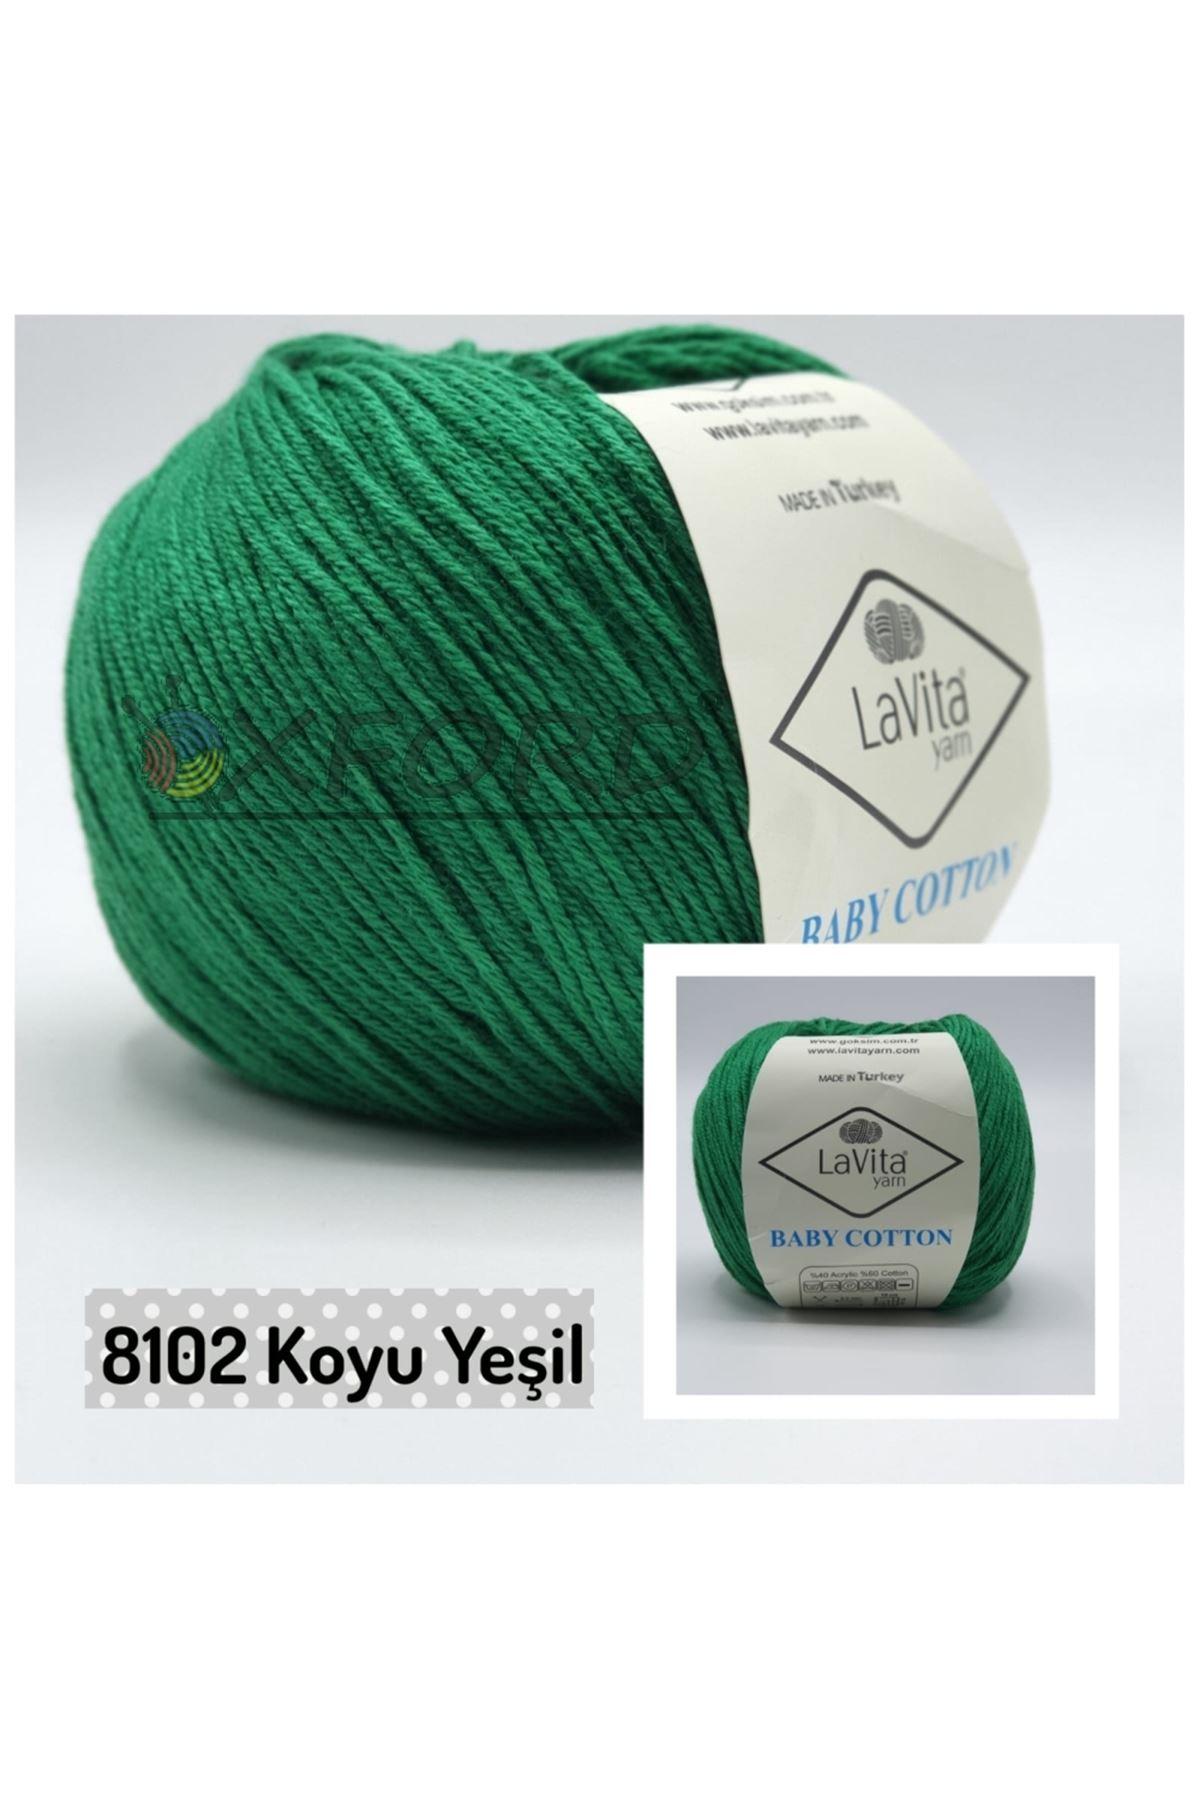 Lavita Baby Cotton 8102 Koyu Yeşil